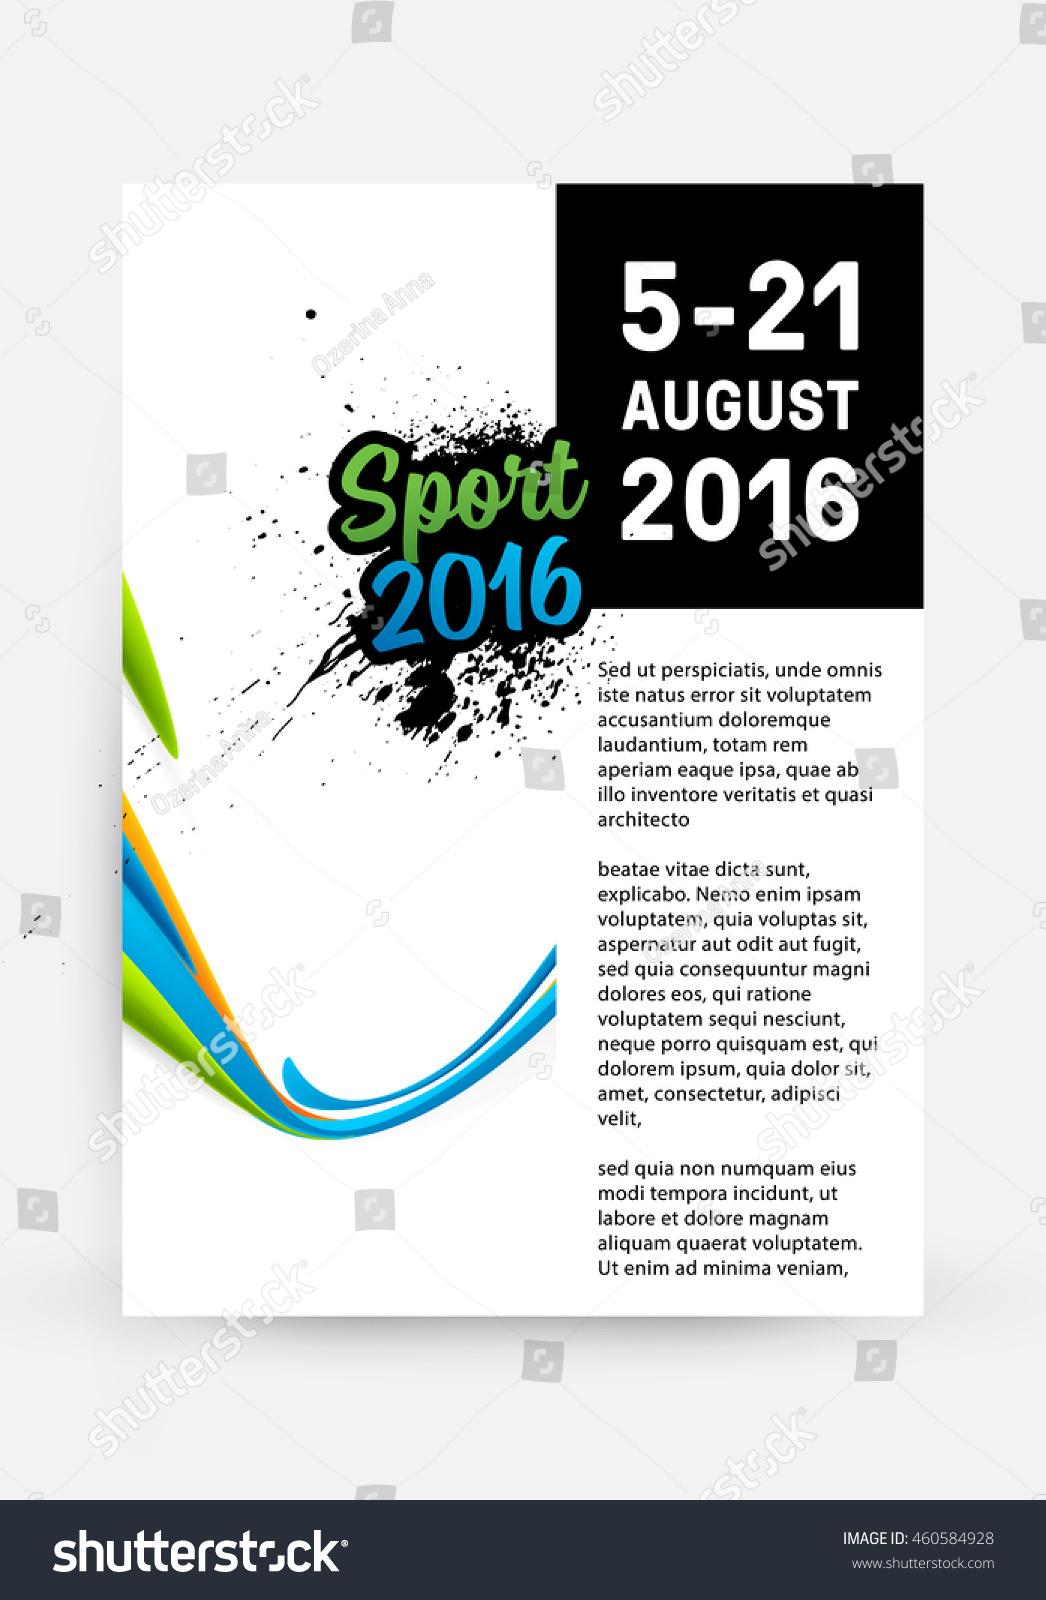 brochure website templates - summer sport 2016 concept template design stock vector